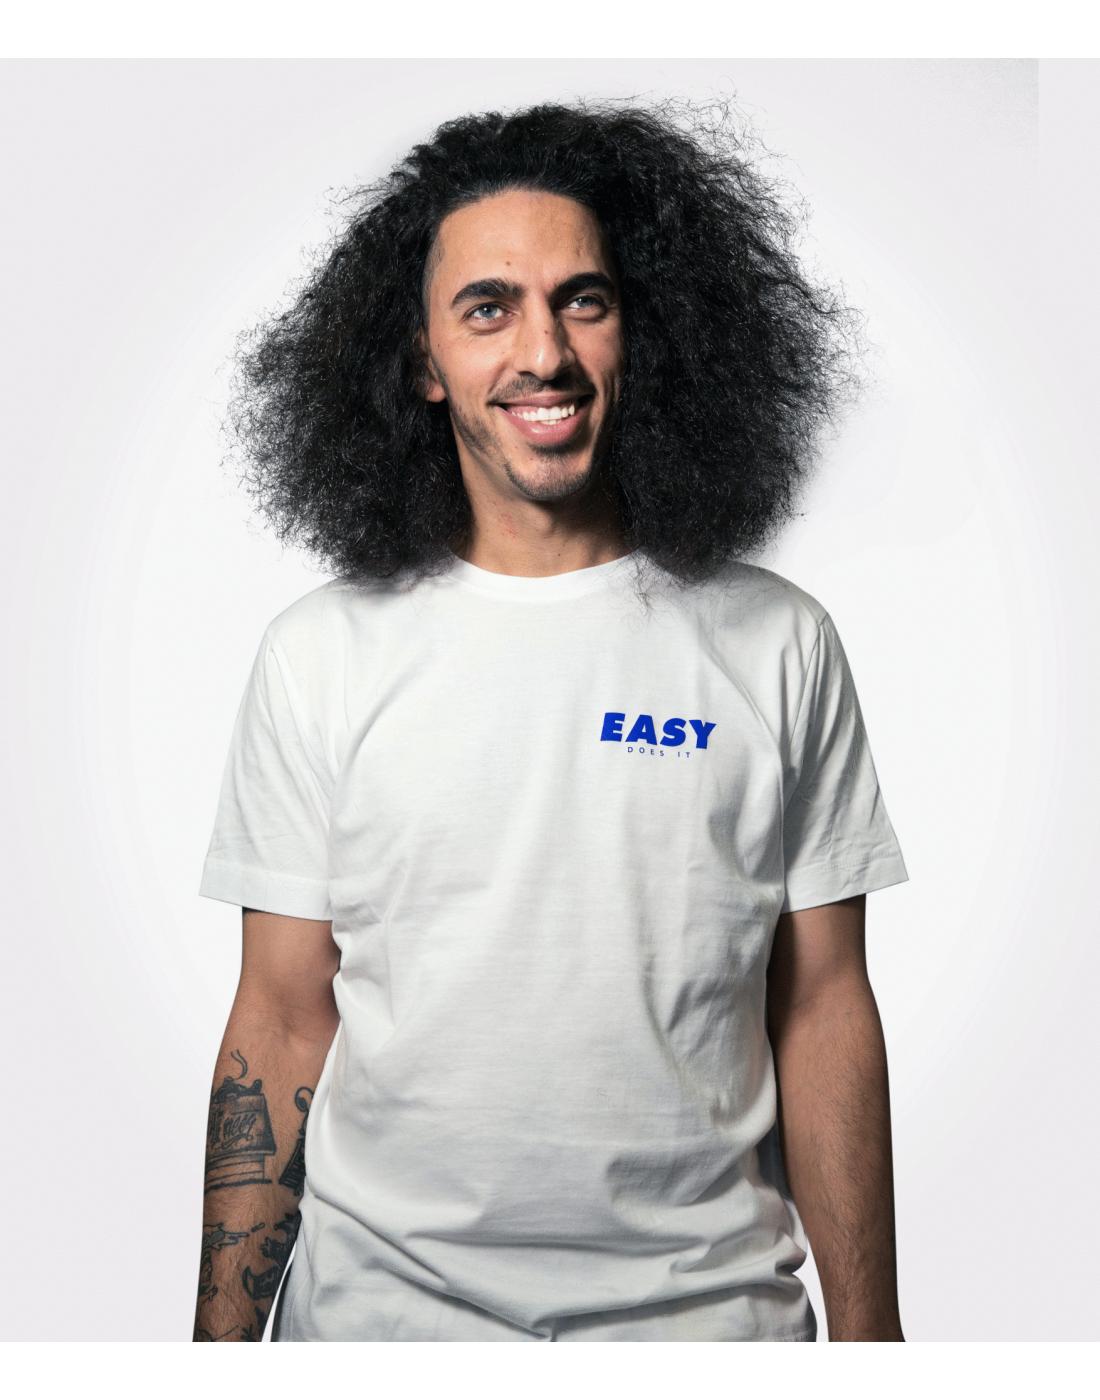 EASY Shirt Small Blue